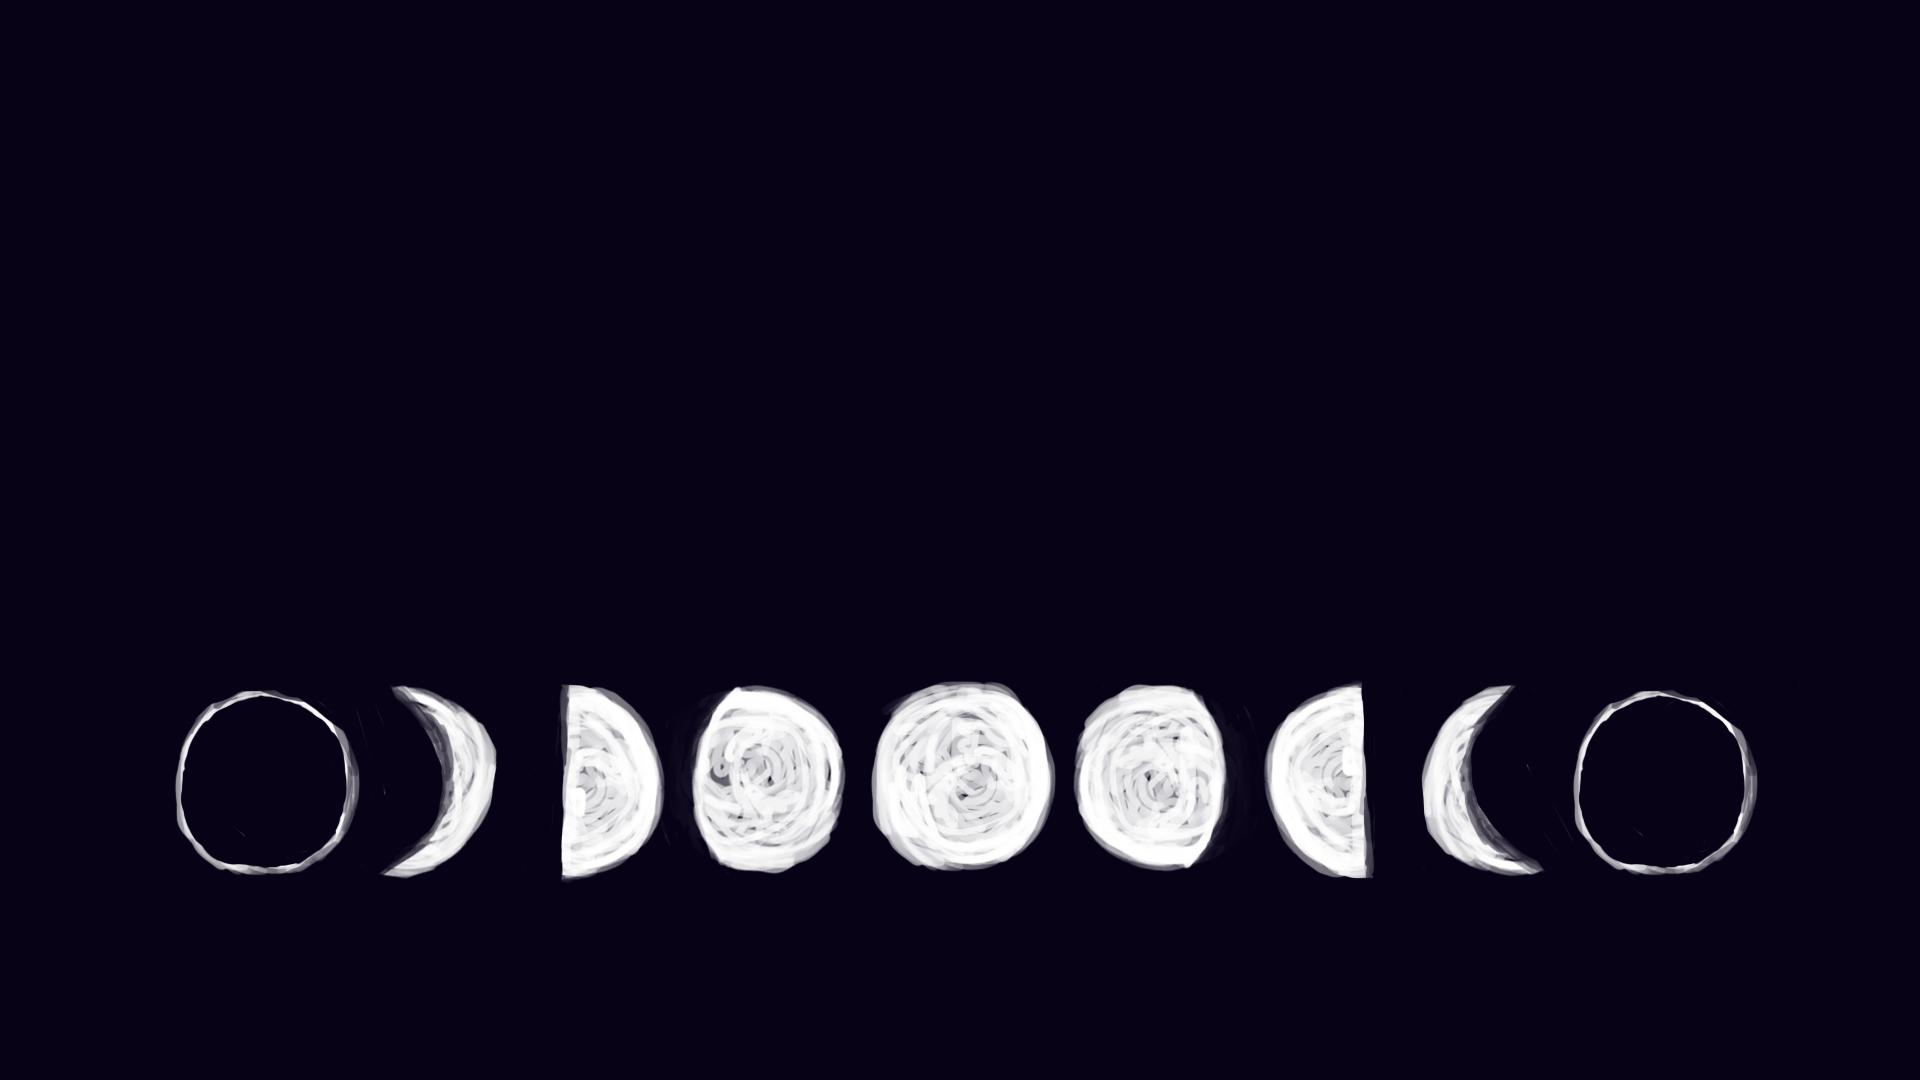 Moon Aesthetic Wallpaper Desktop